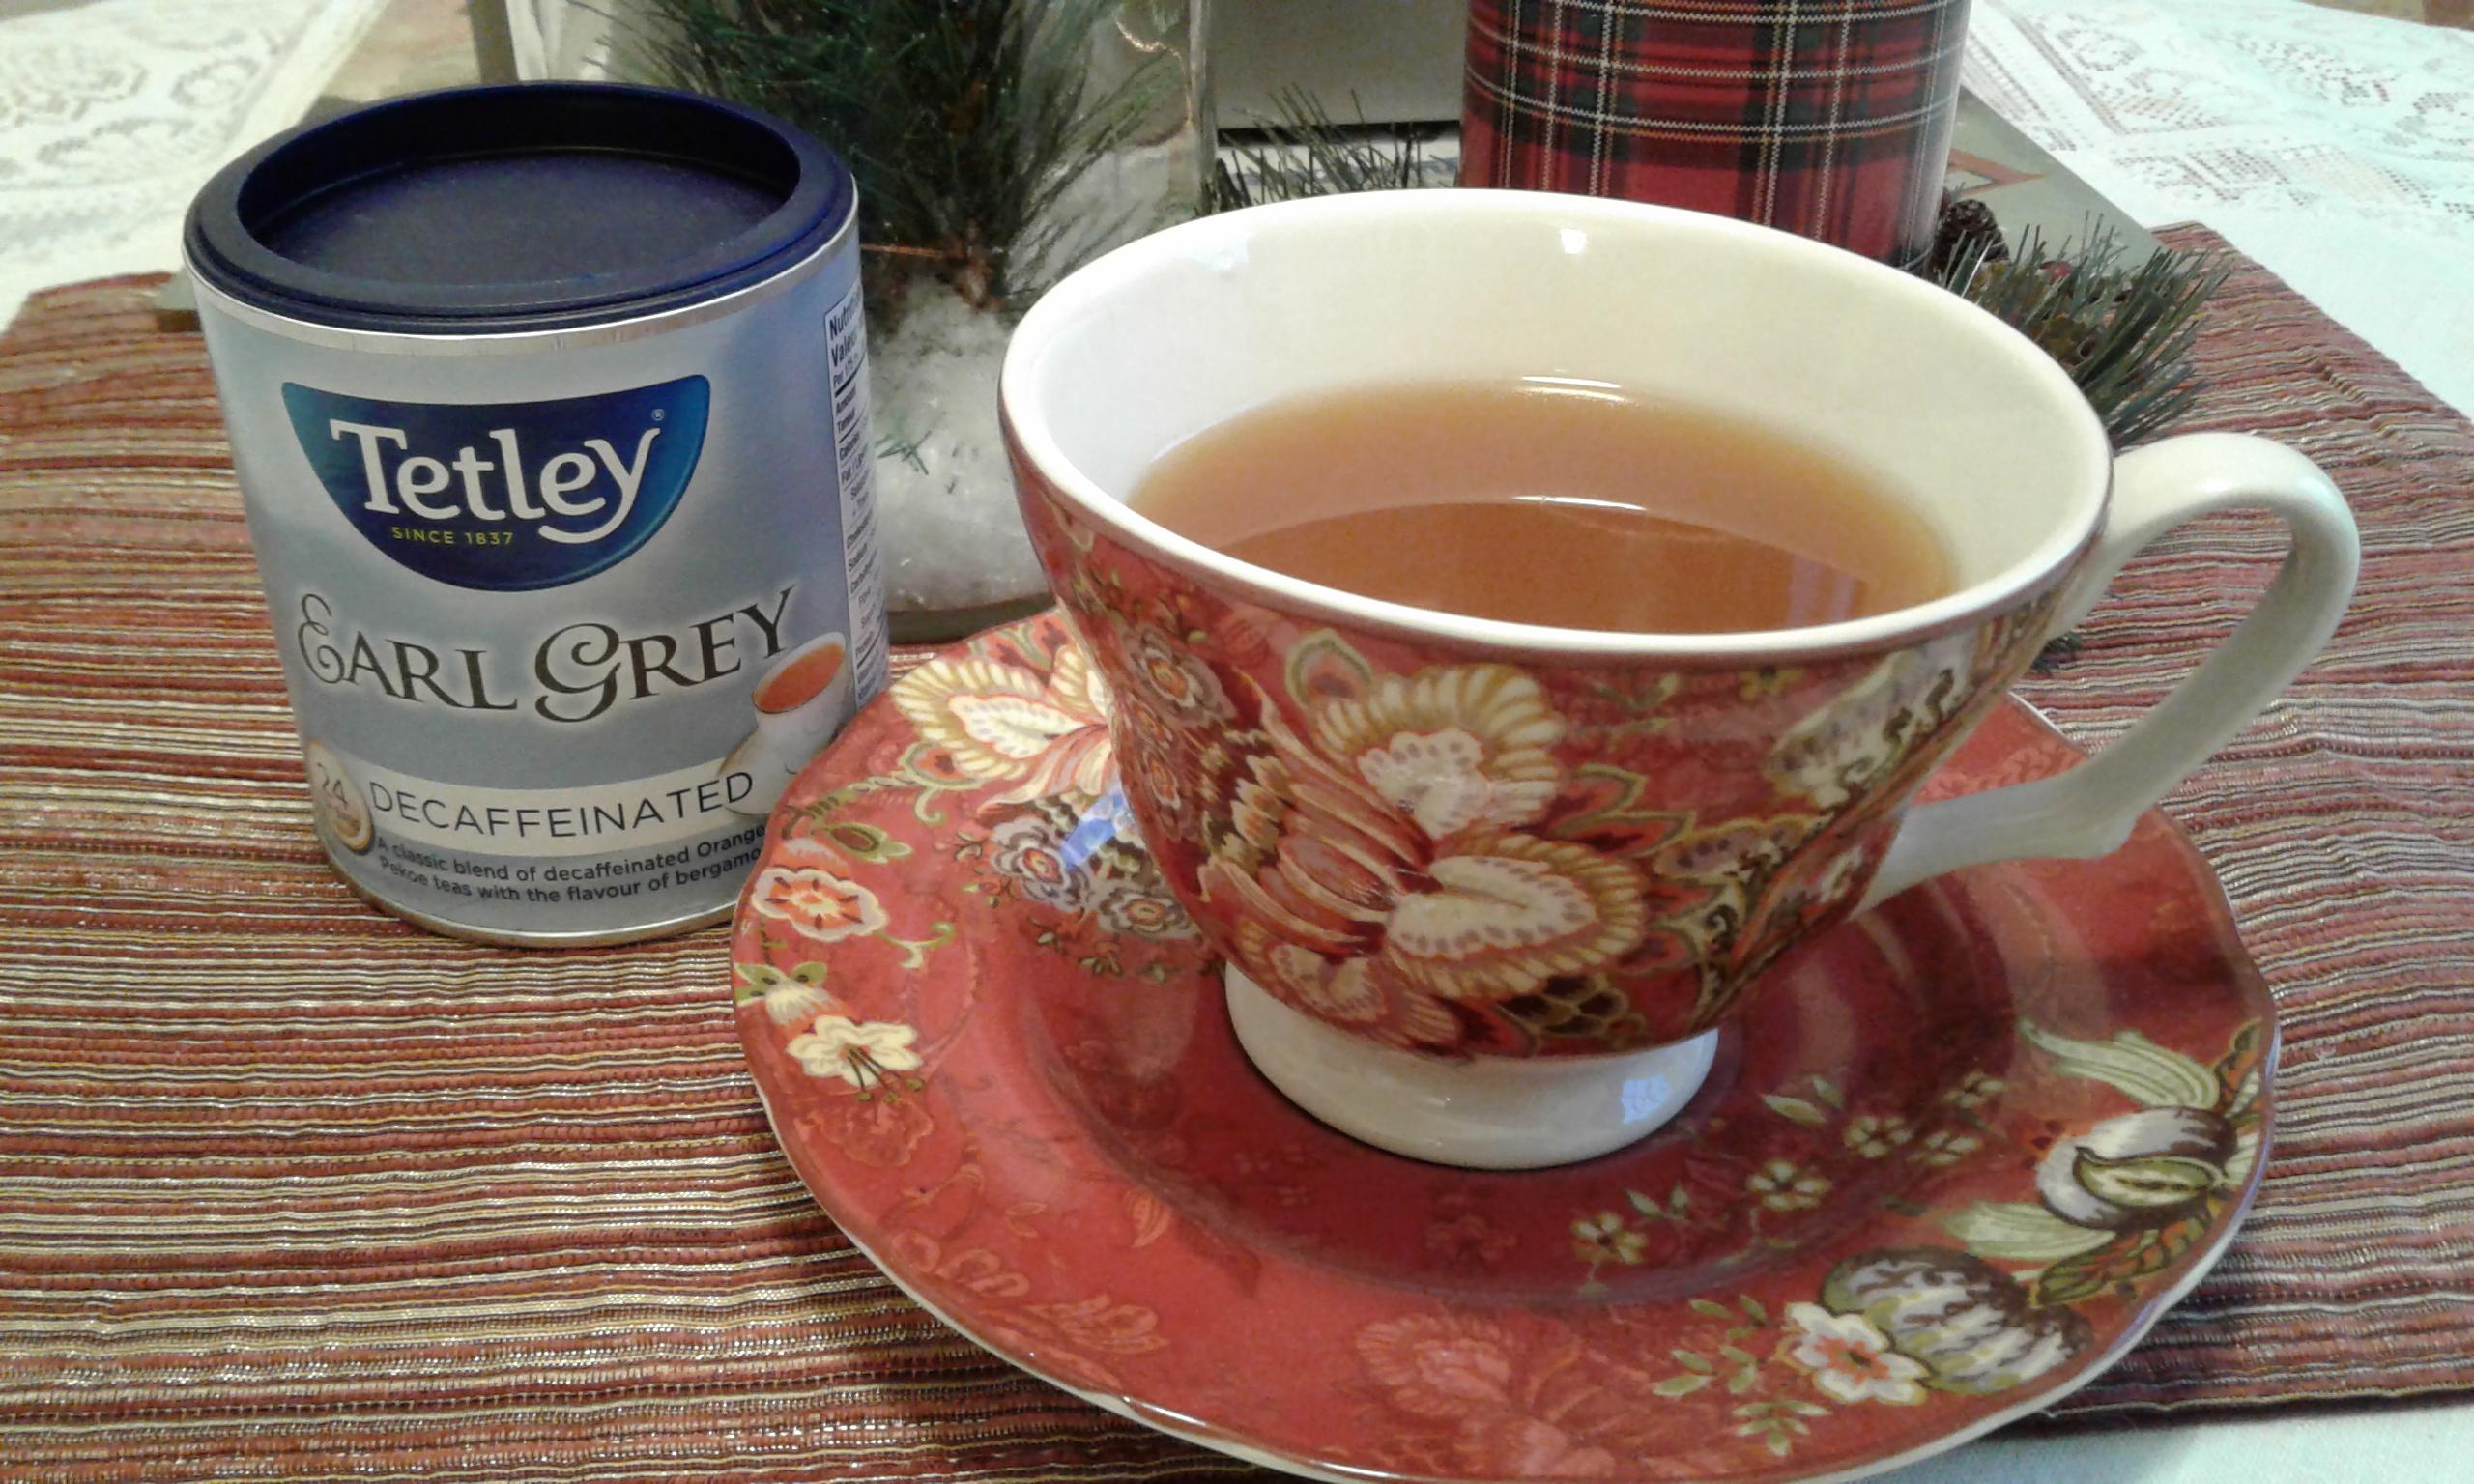 Cider and tea mixture